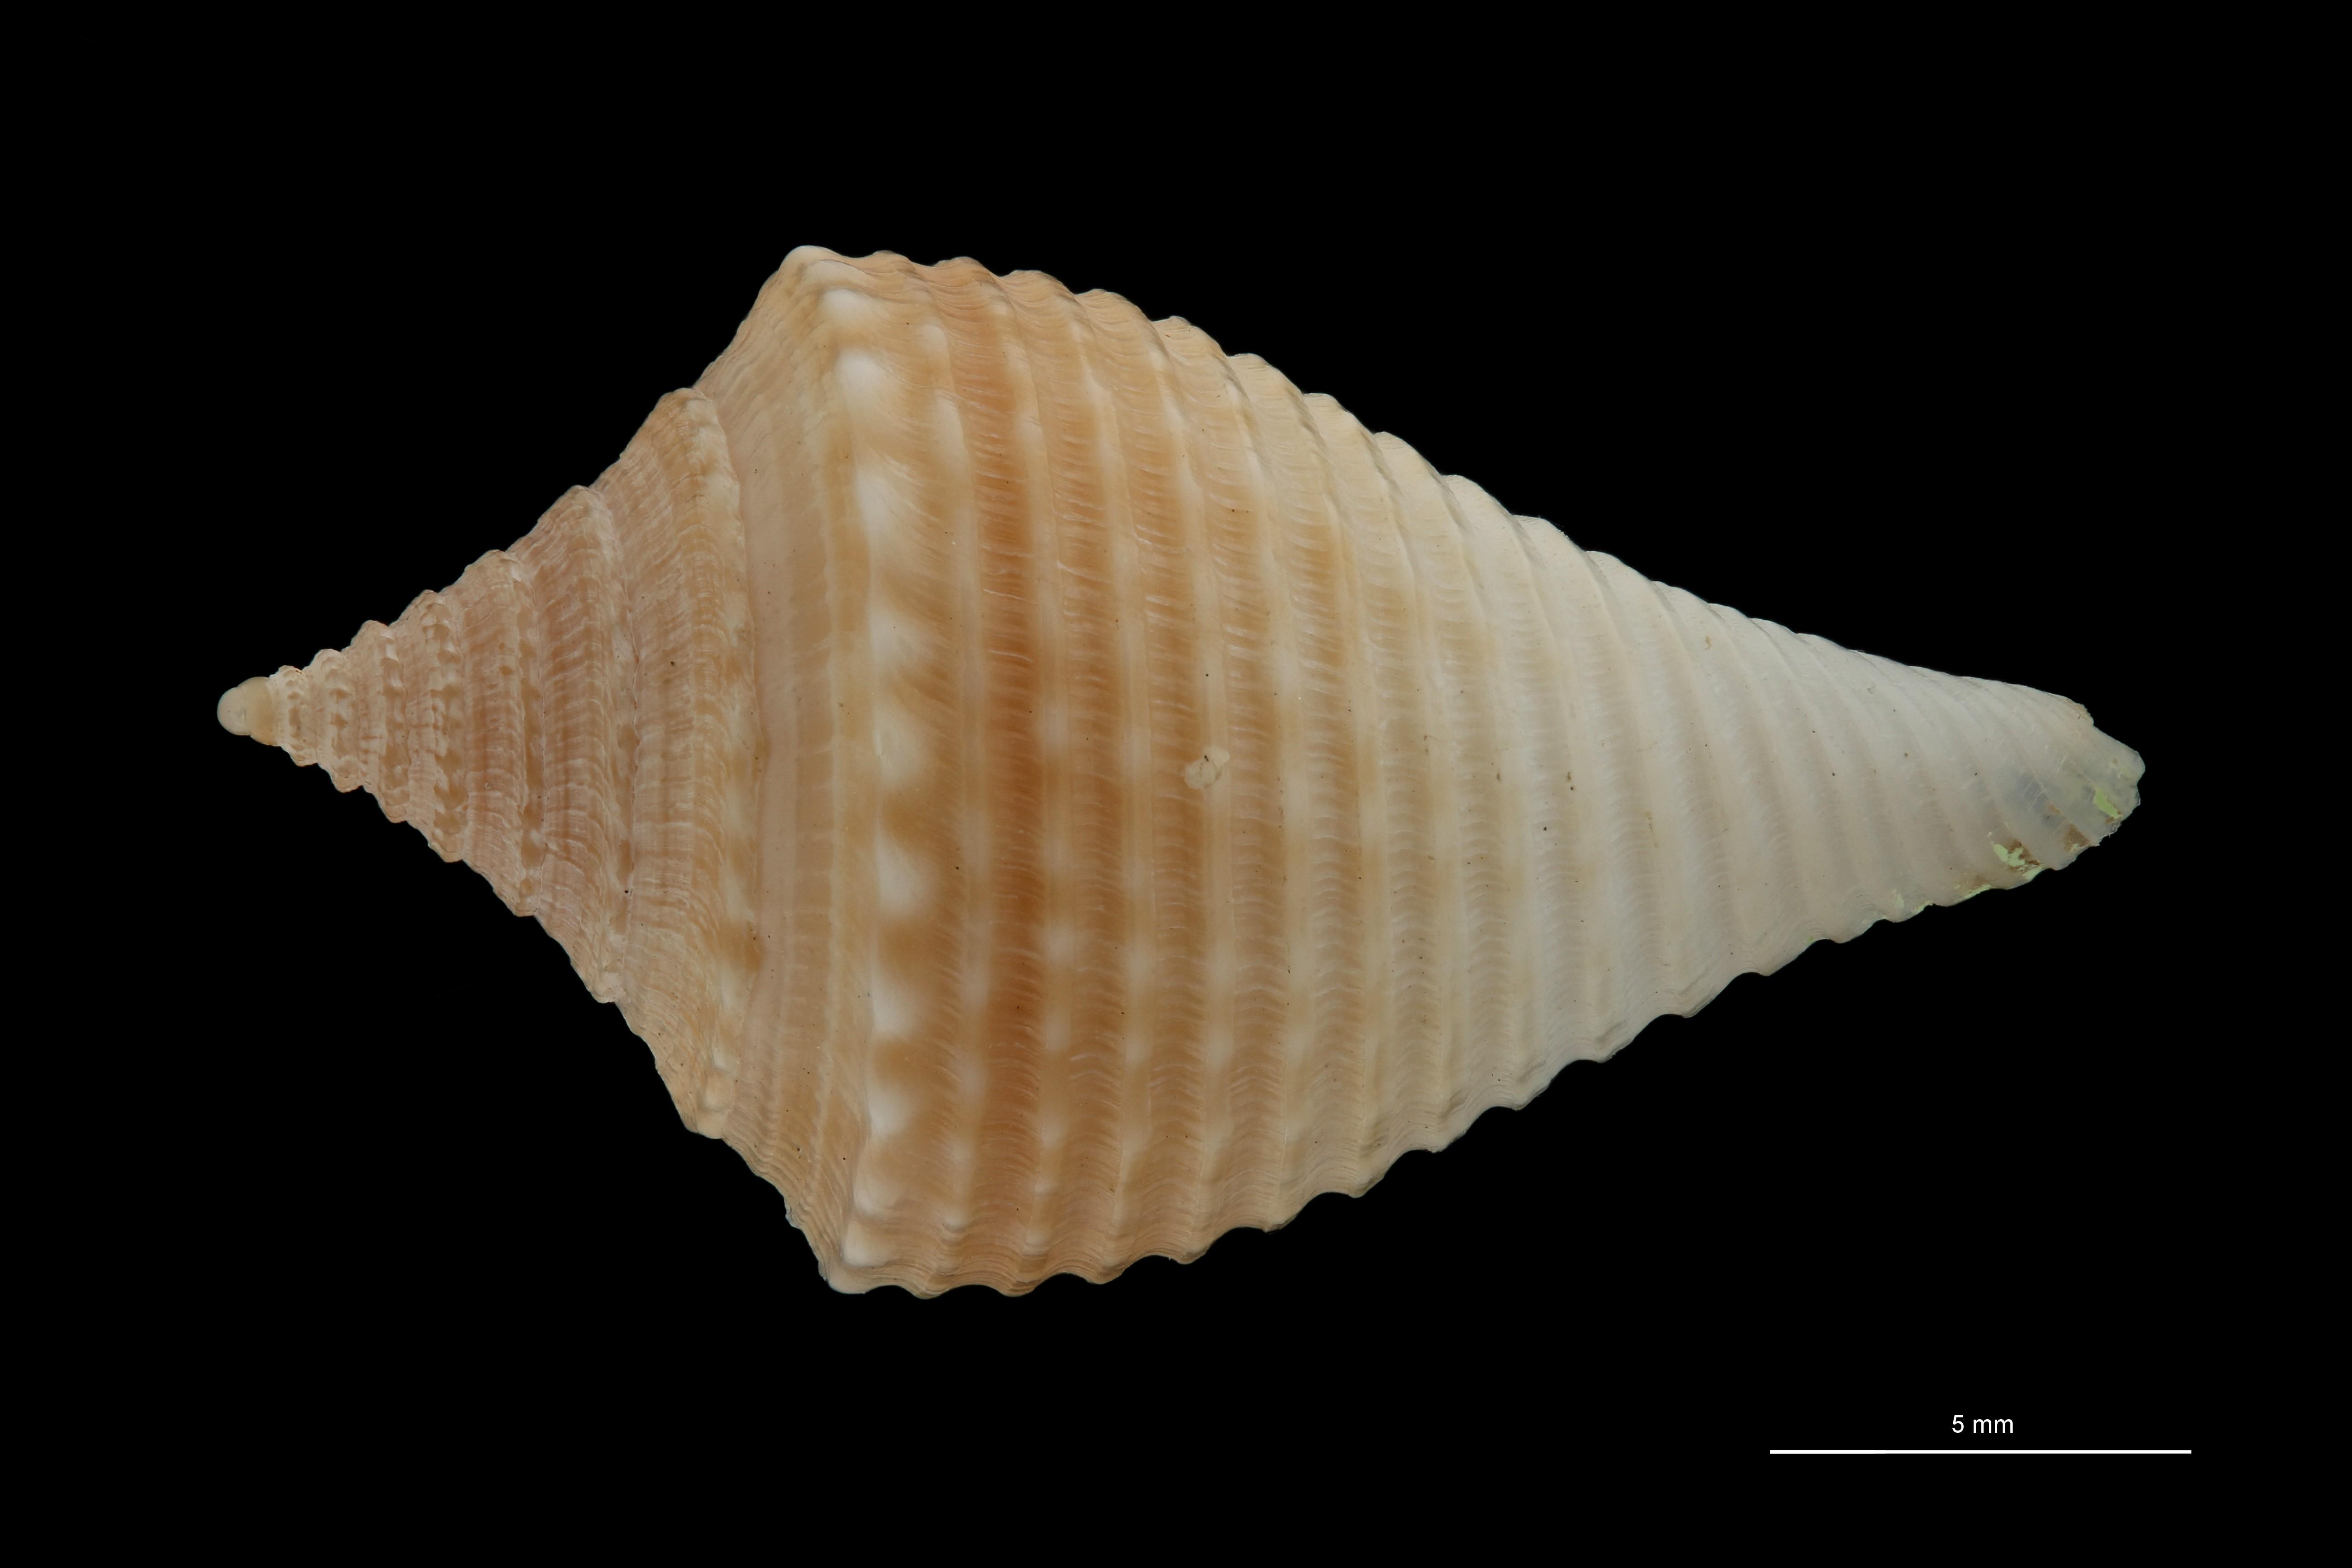 BE-RBINS-INV MT.3033 Conus guyanensis Pt D ZS PMax Scaled.jpg